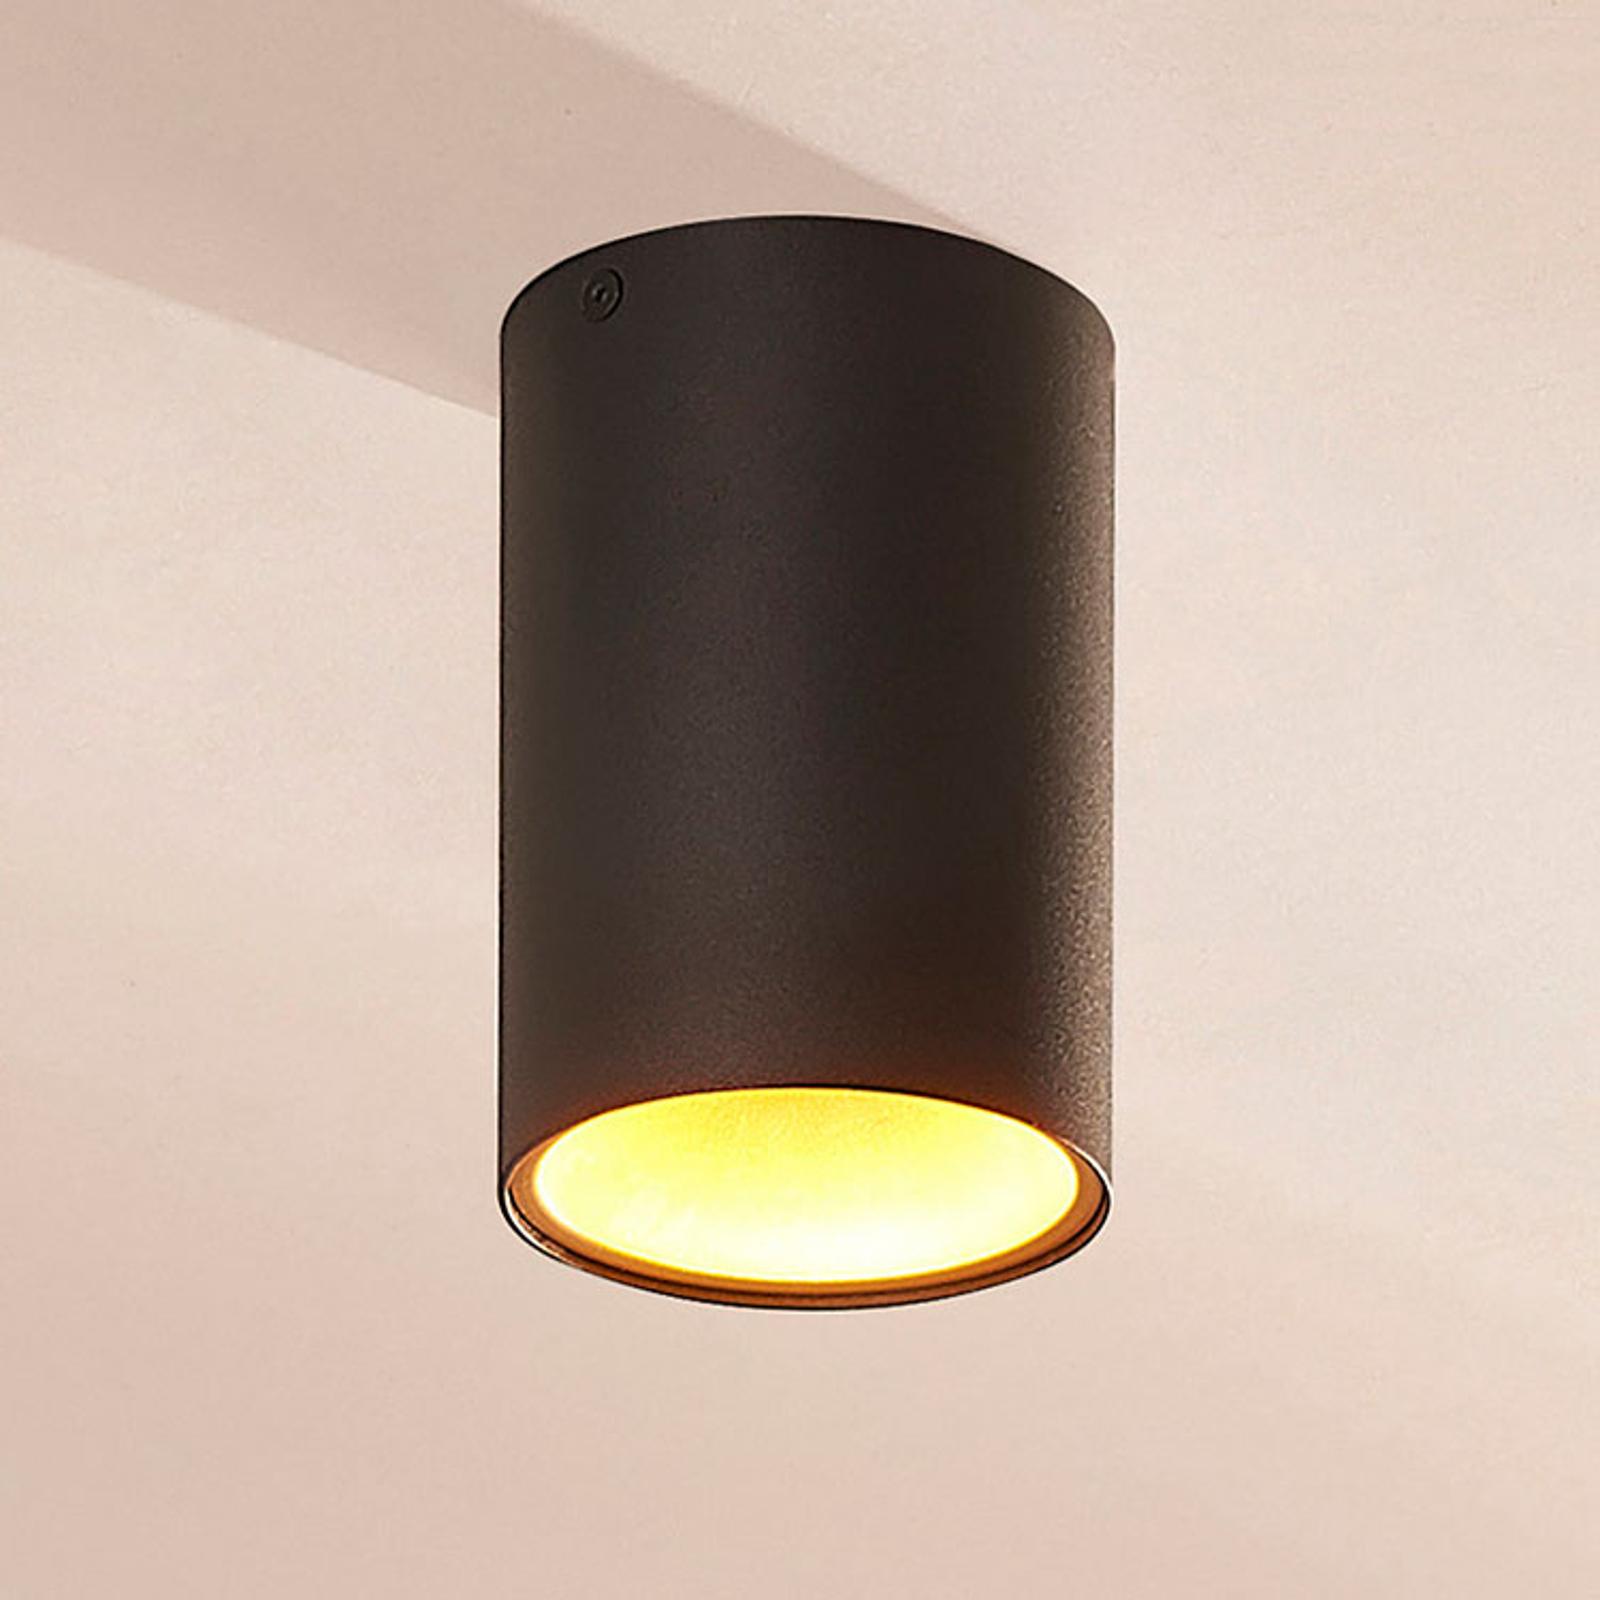 Vinja Halogen Ceiling Light With Inner Reflector Lights Co Uk